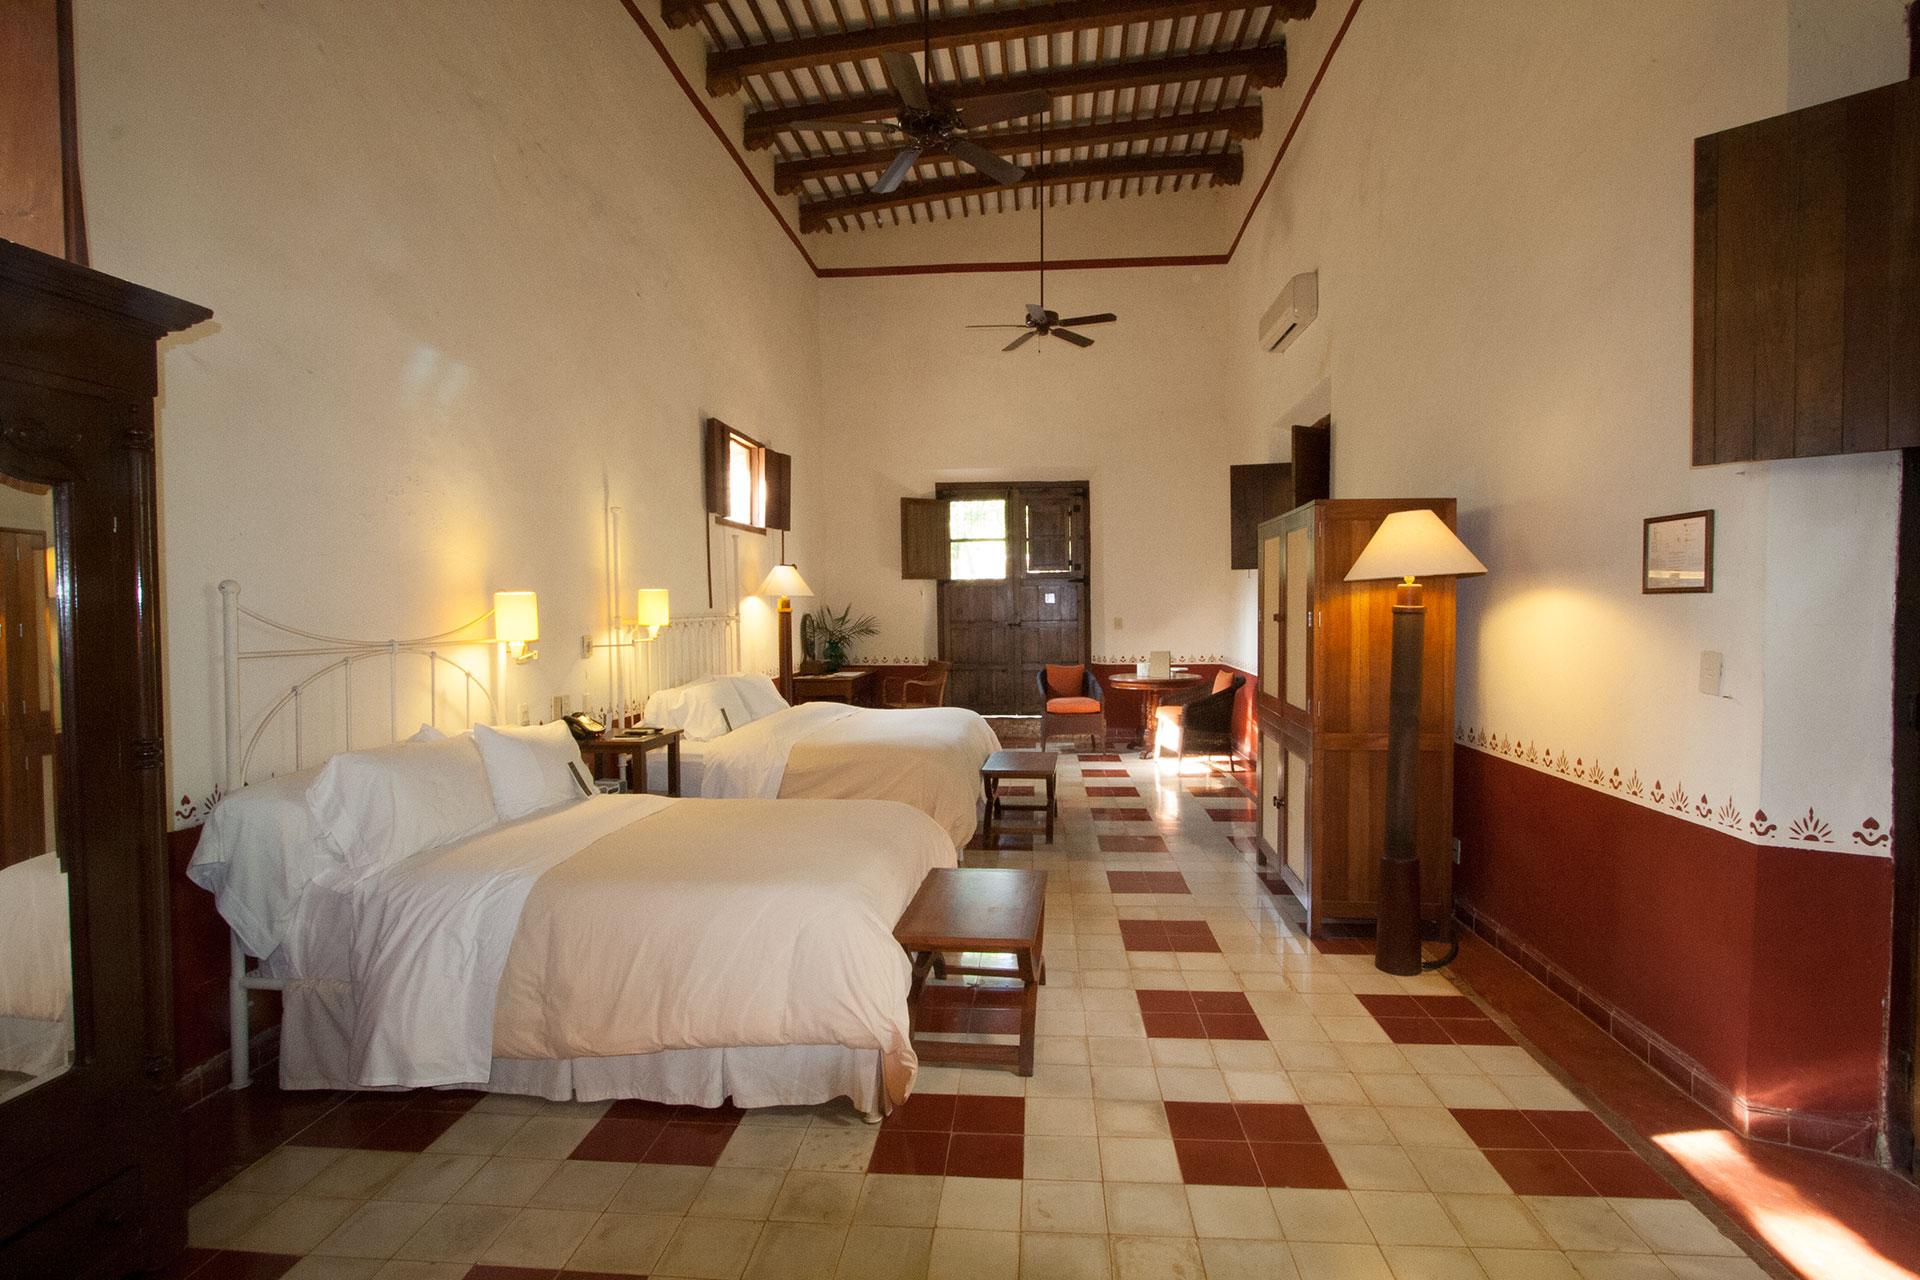 Hacienda Santa Rosa Yucatan Review By Differentworld Com